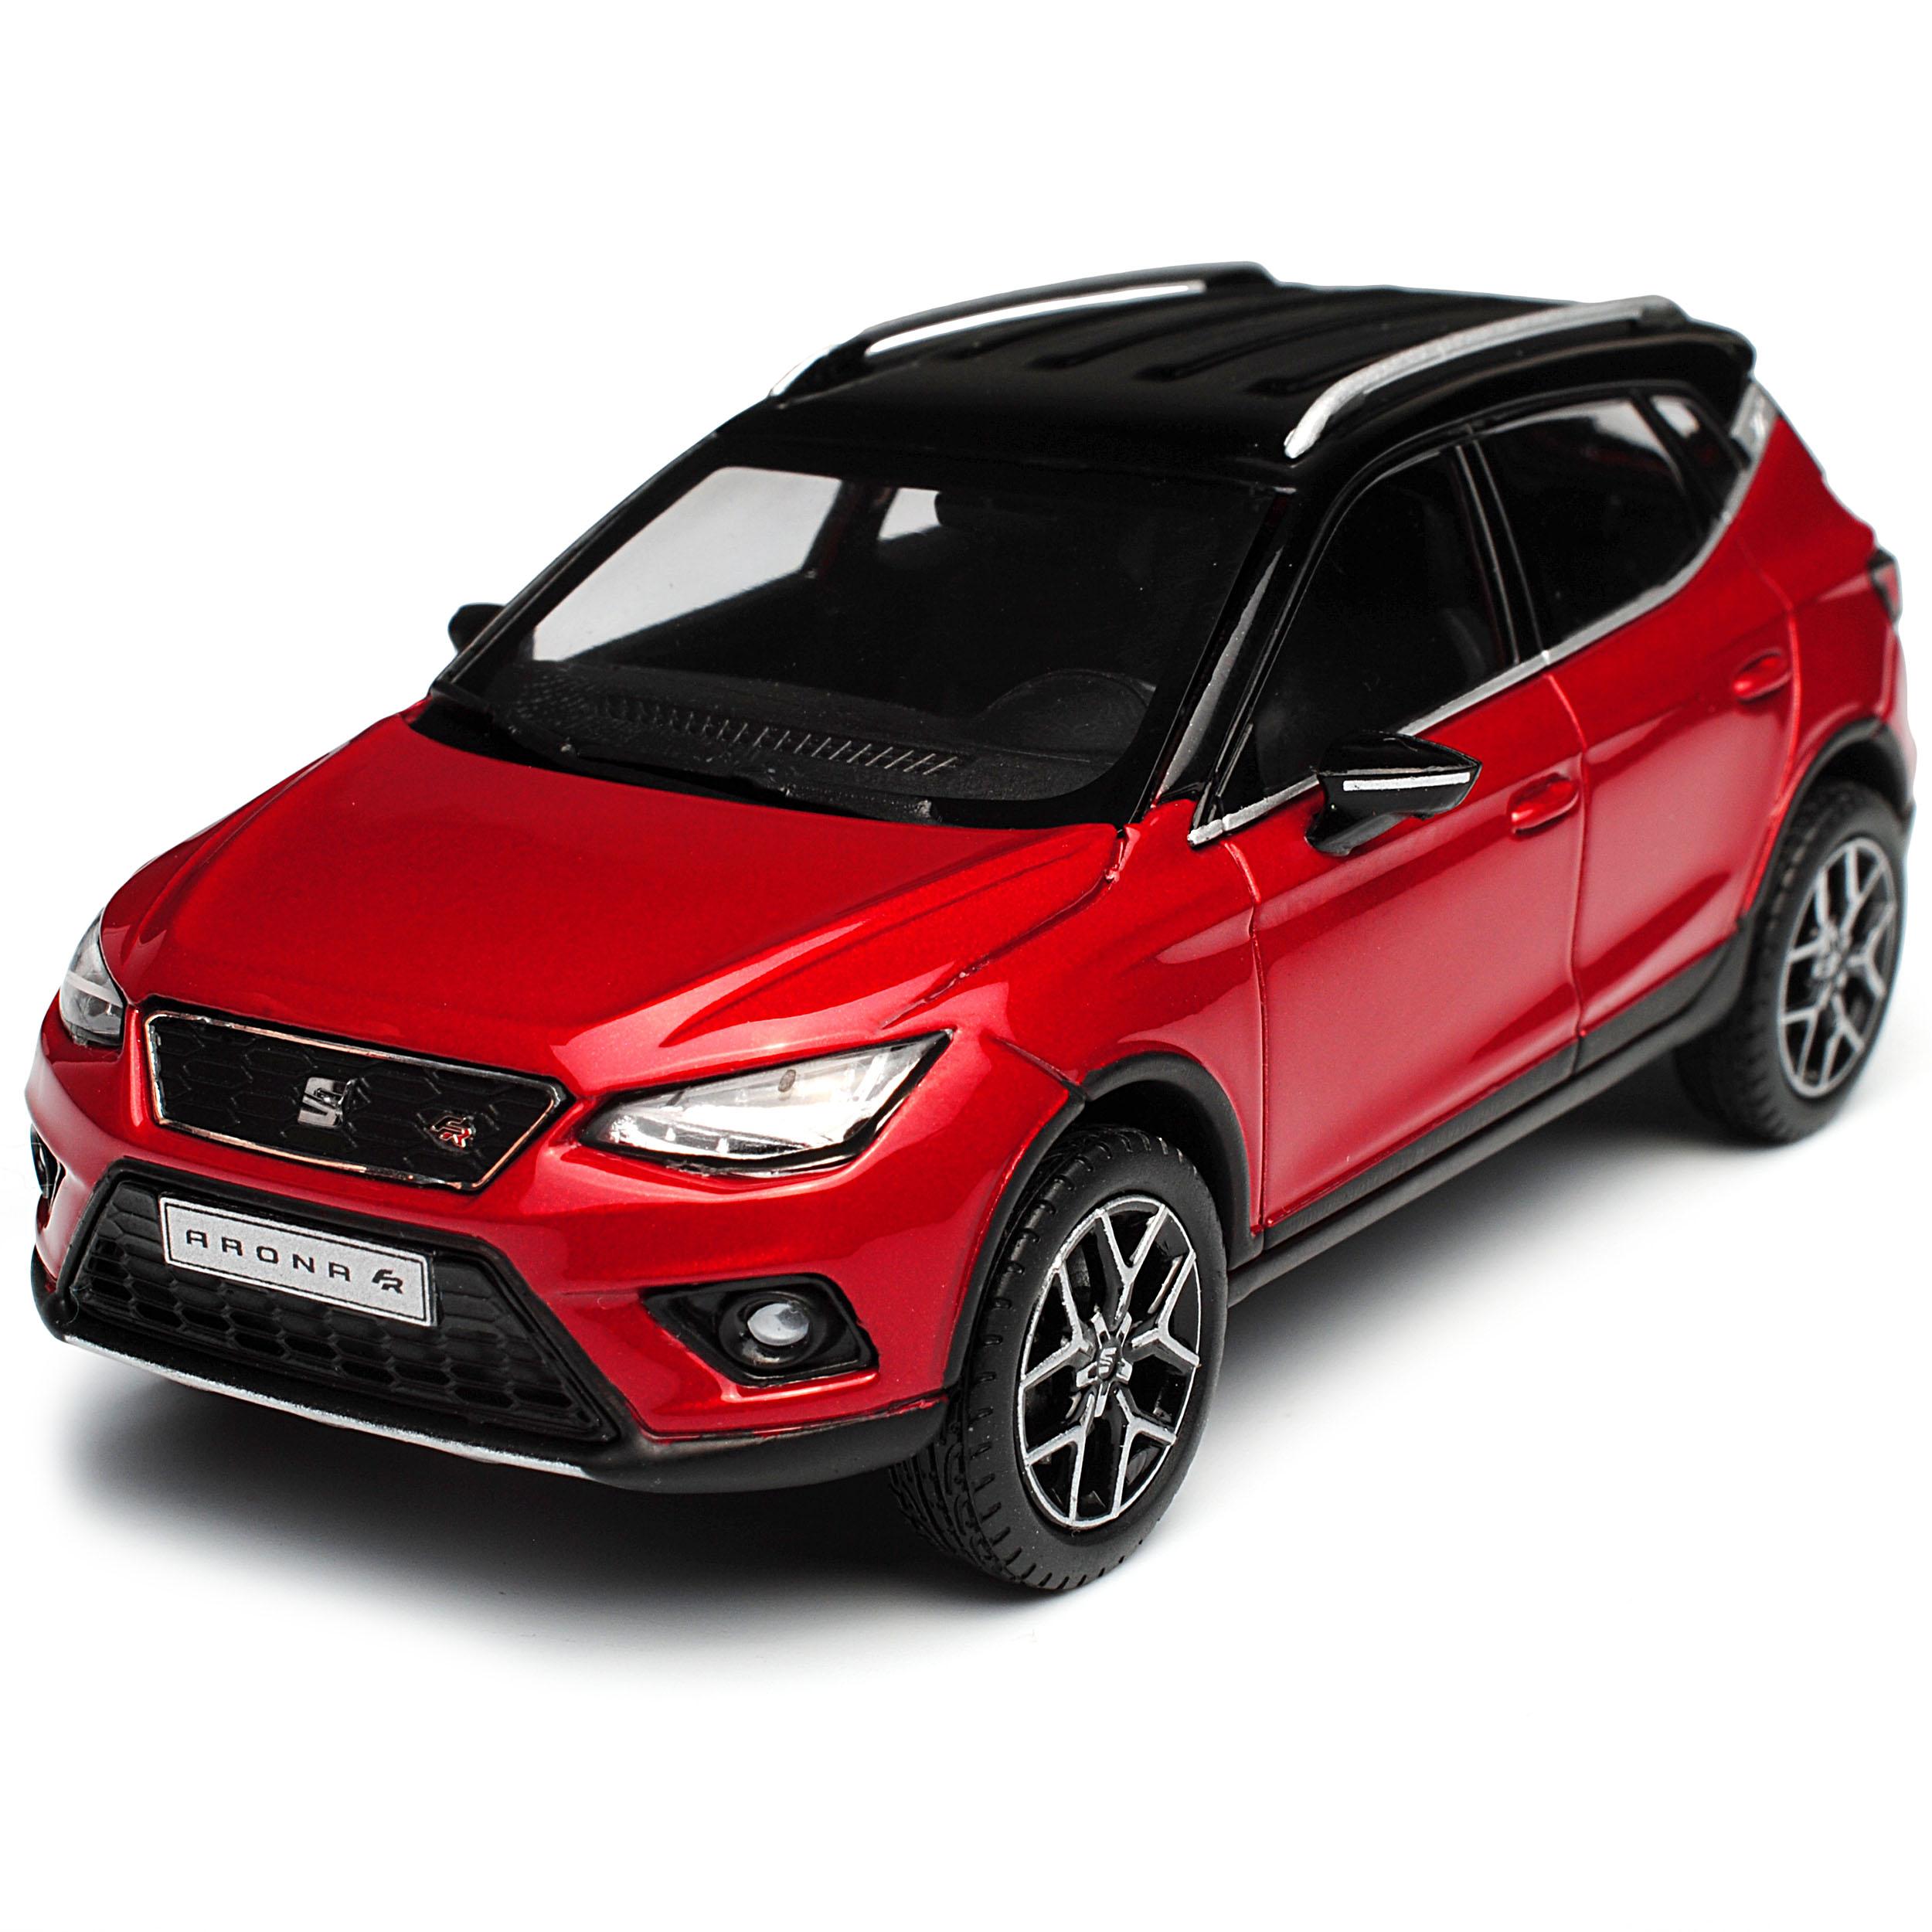 seat arona suv desire rot ab 2017 1 43 seat modell auto. Black Bedroom Furniture Sets. Home Design Ideas